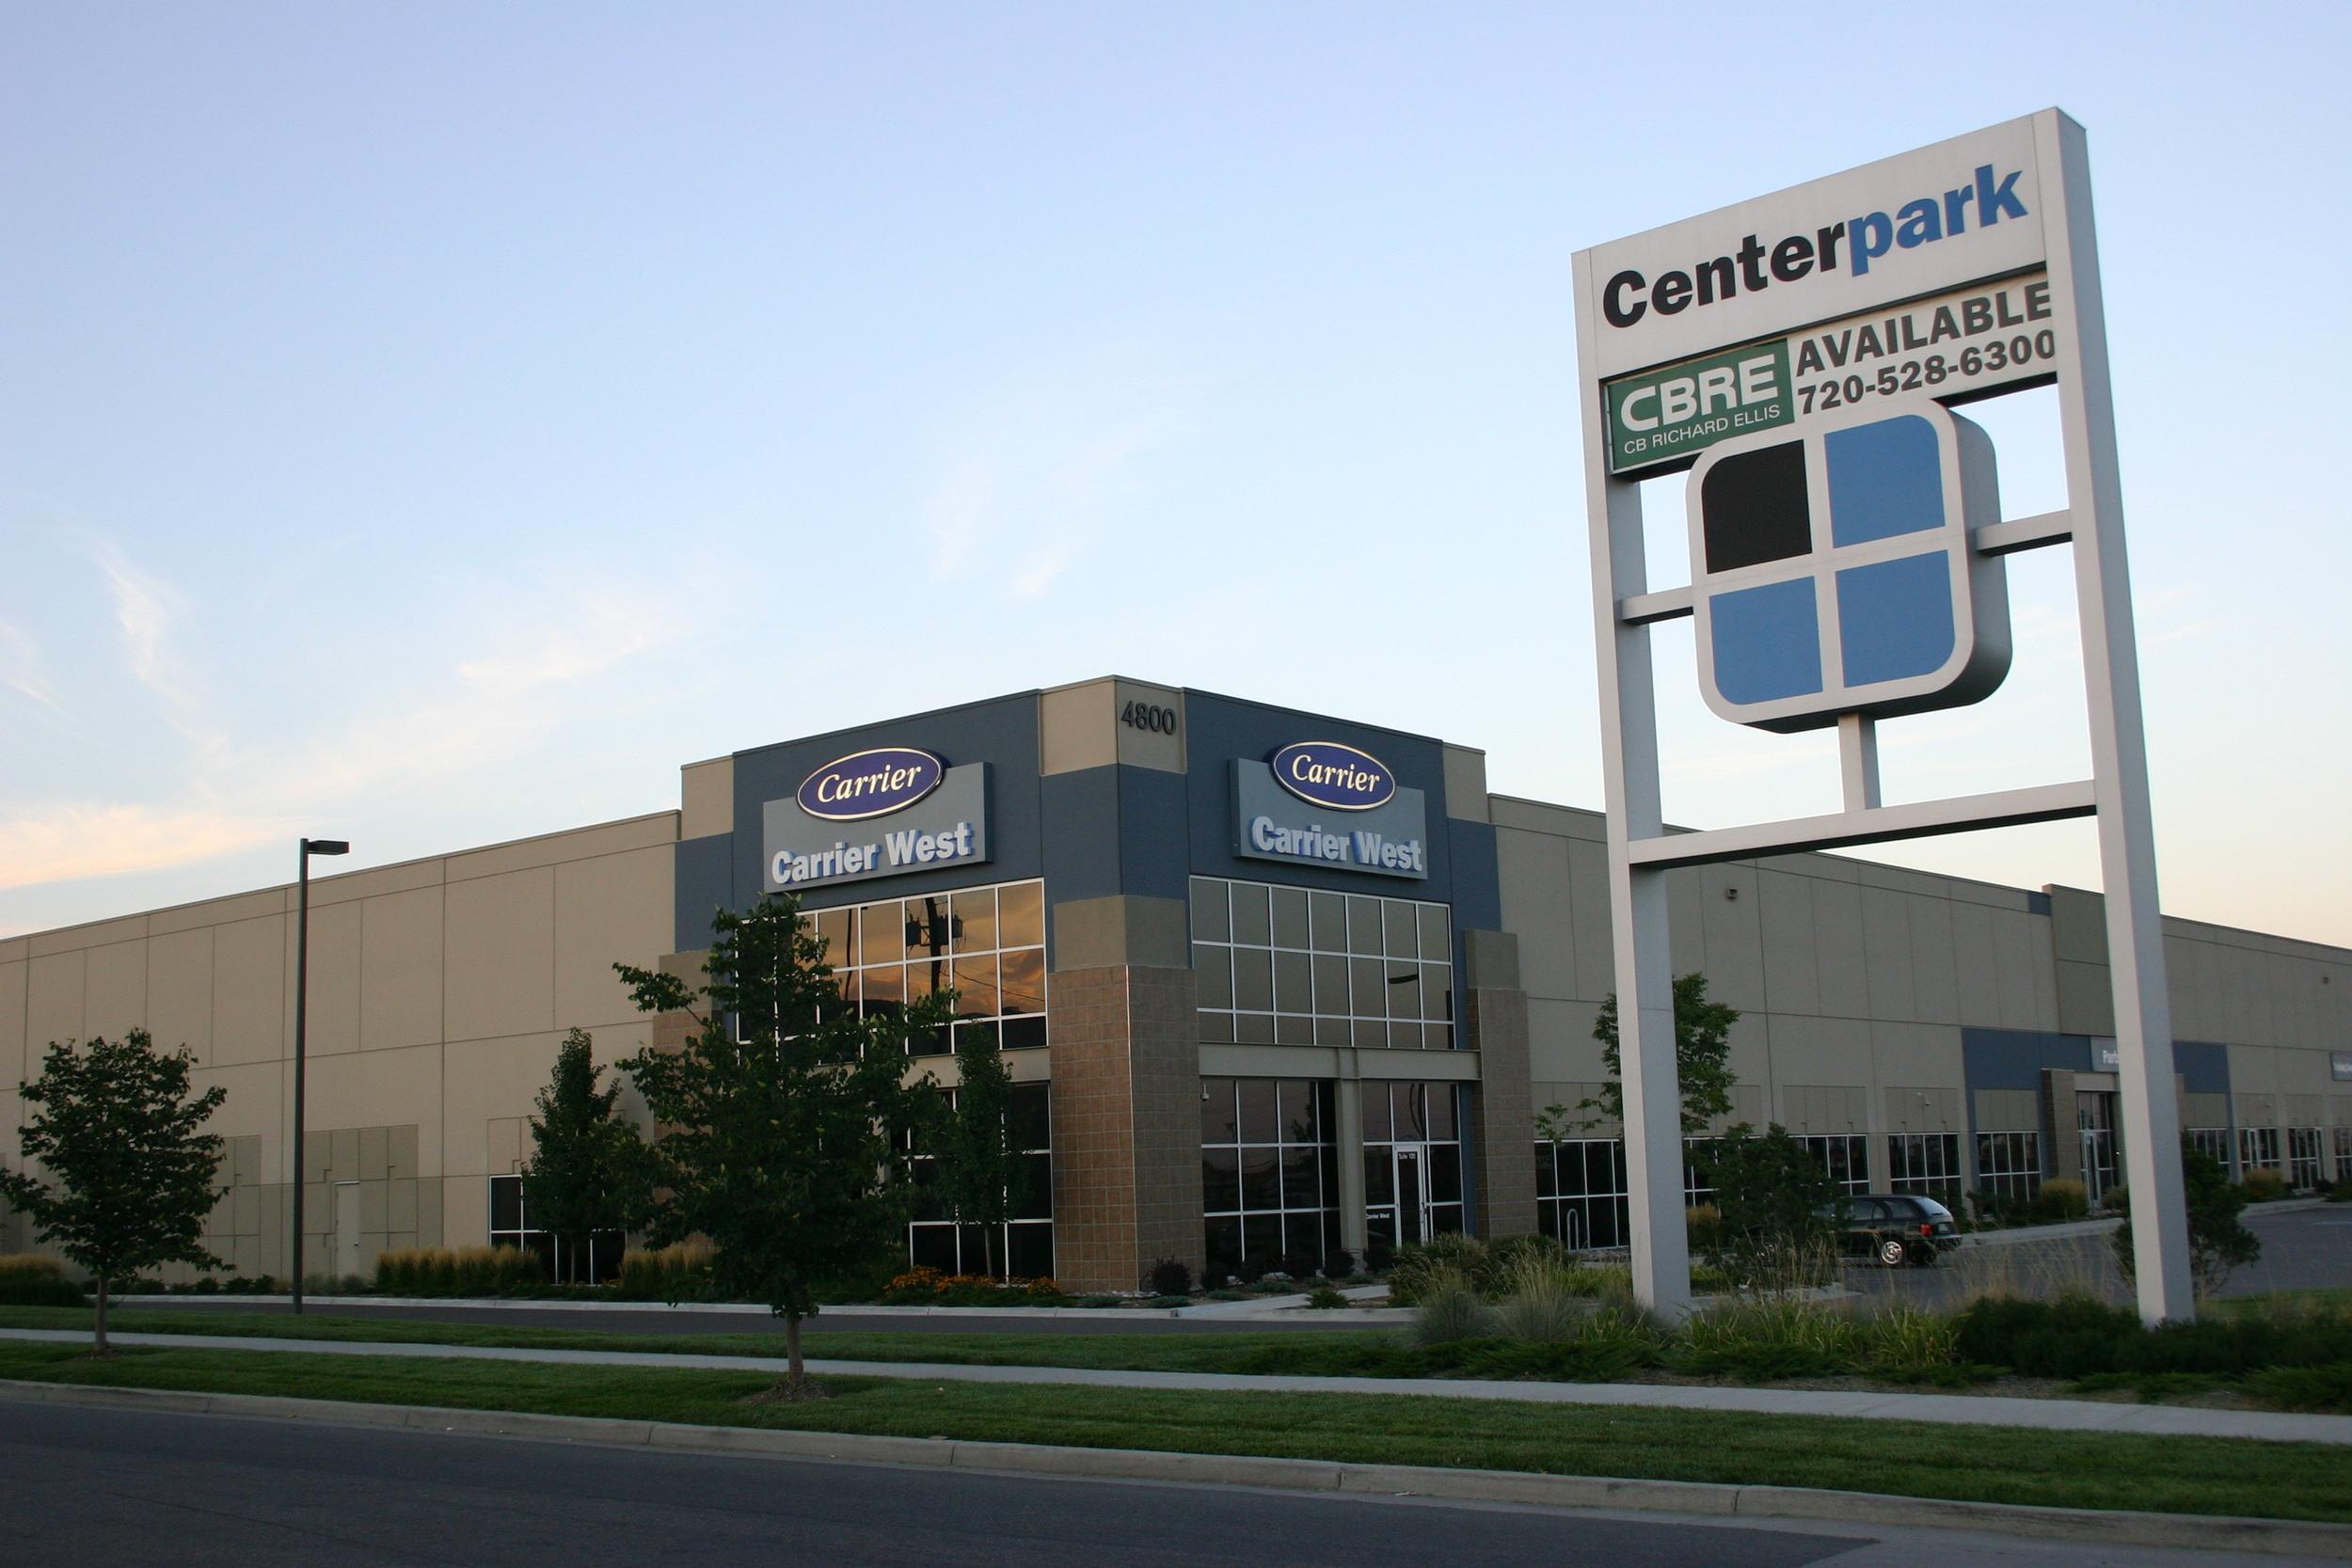 Centerpark